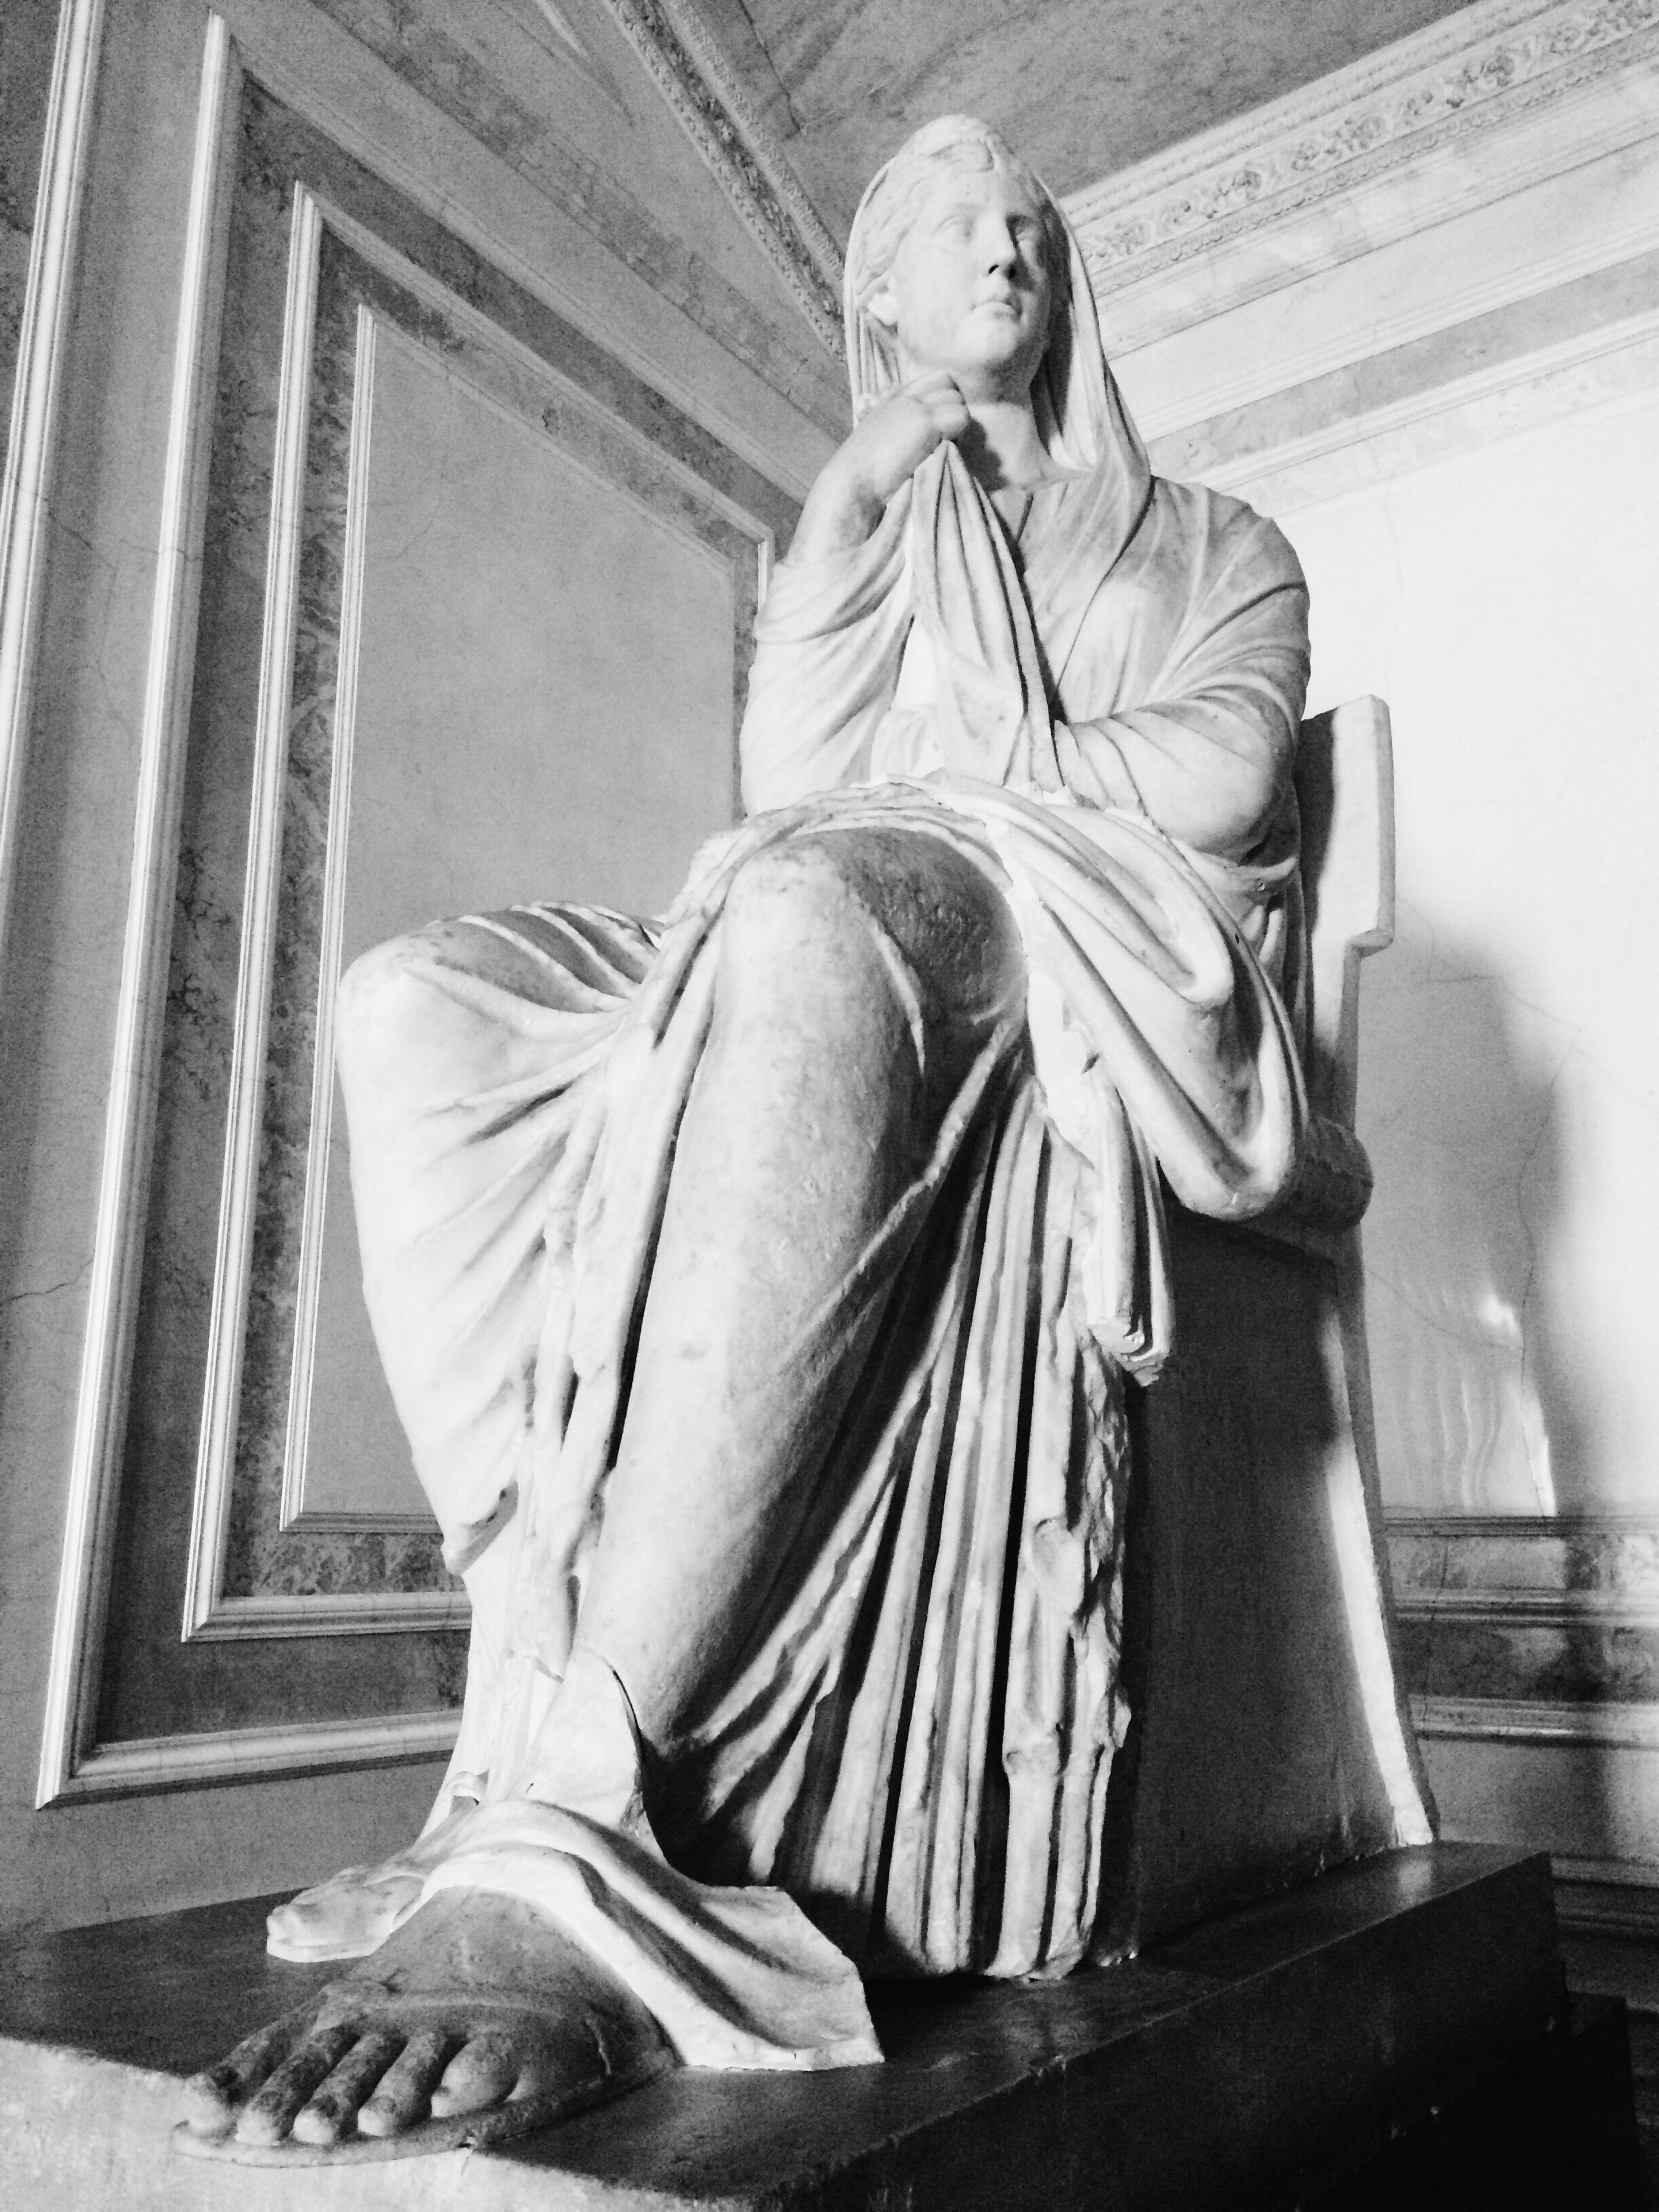 statue, human representation, sculpture, art and craft, low angle view, art, memories, creativity